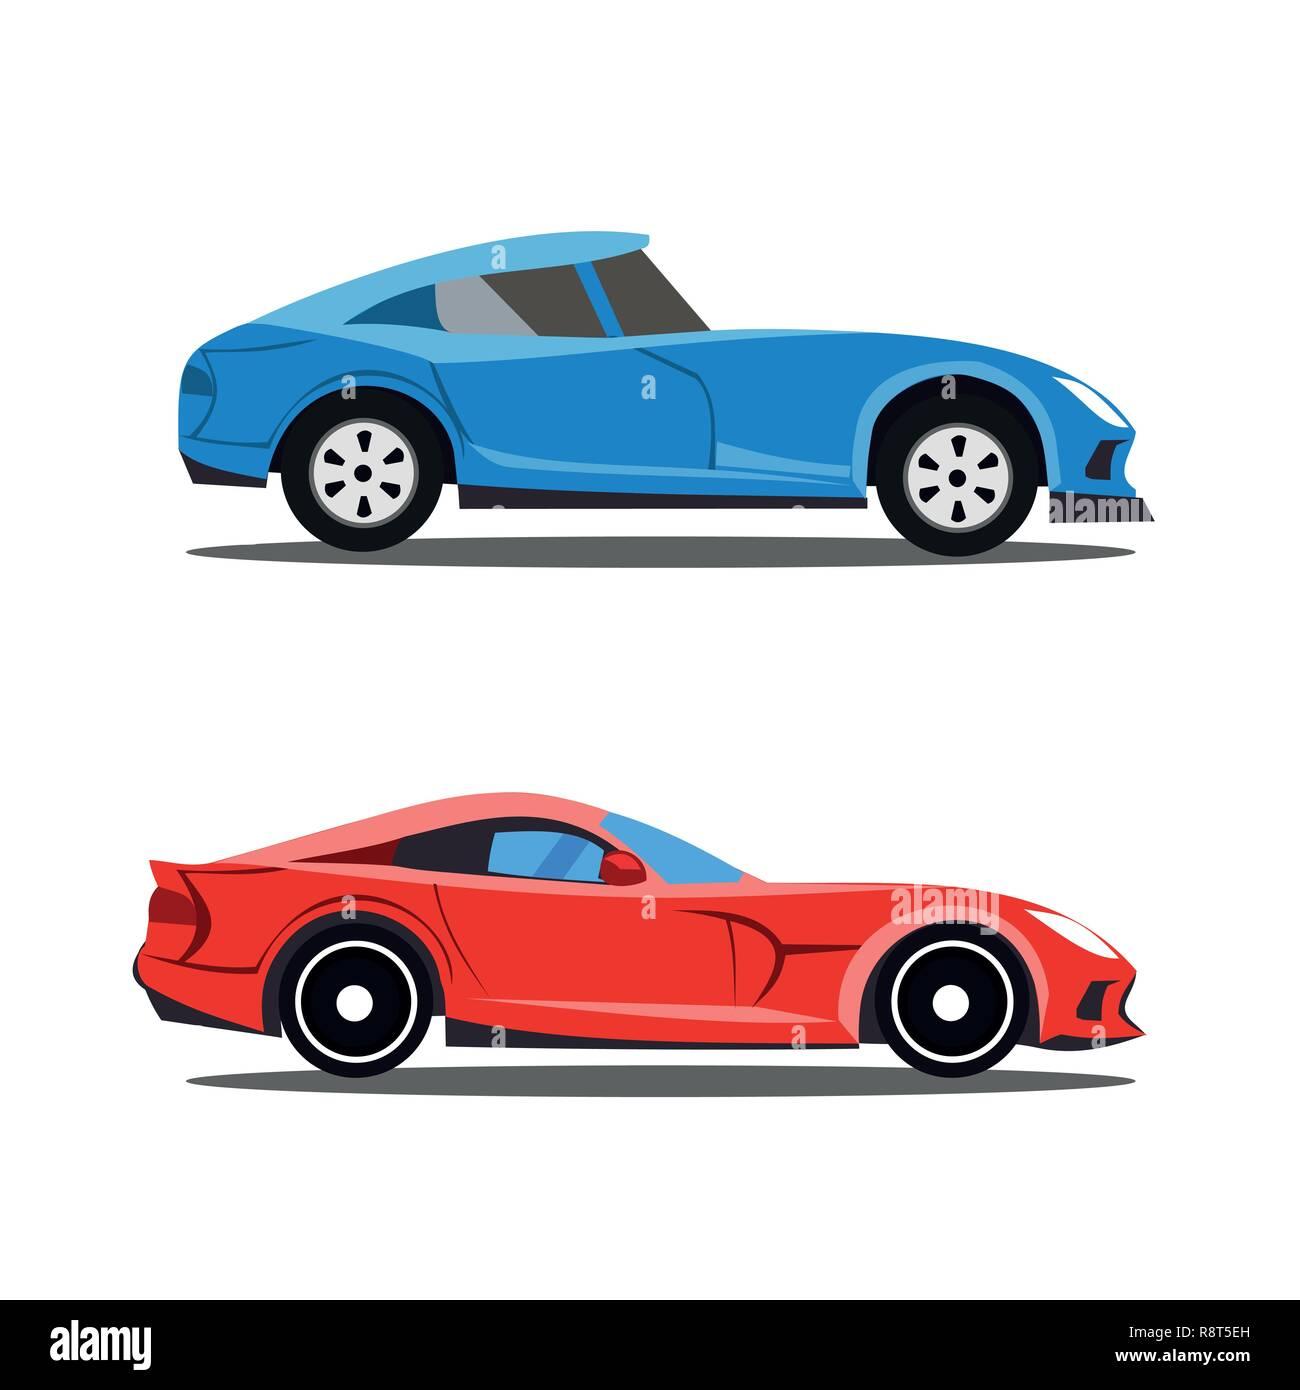 Model of profile cars, car cartoon designs in profile view - Stock Image